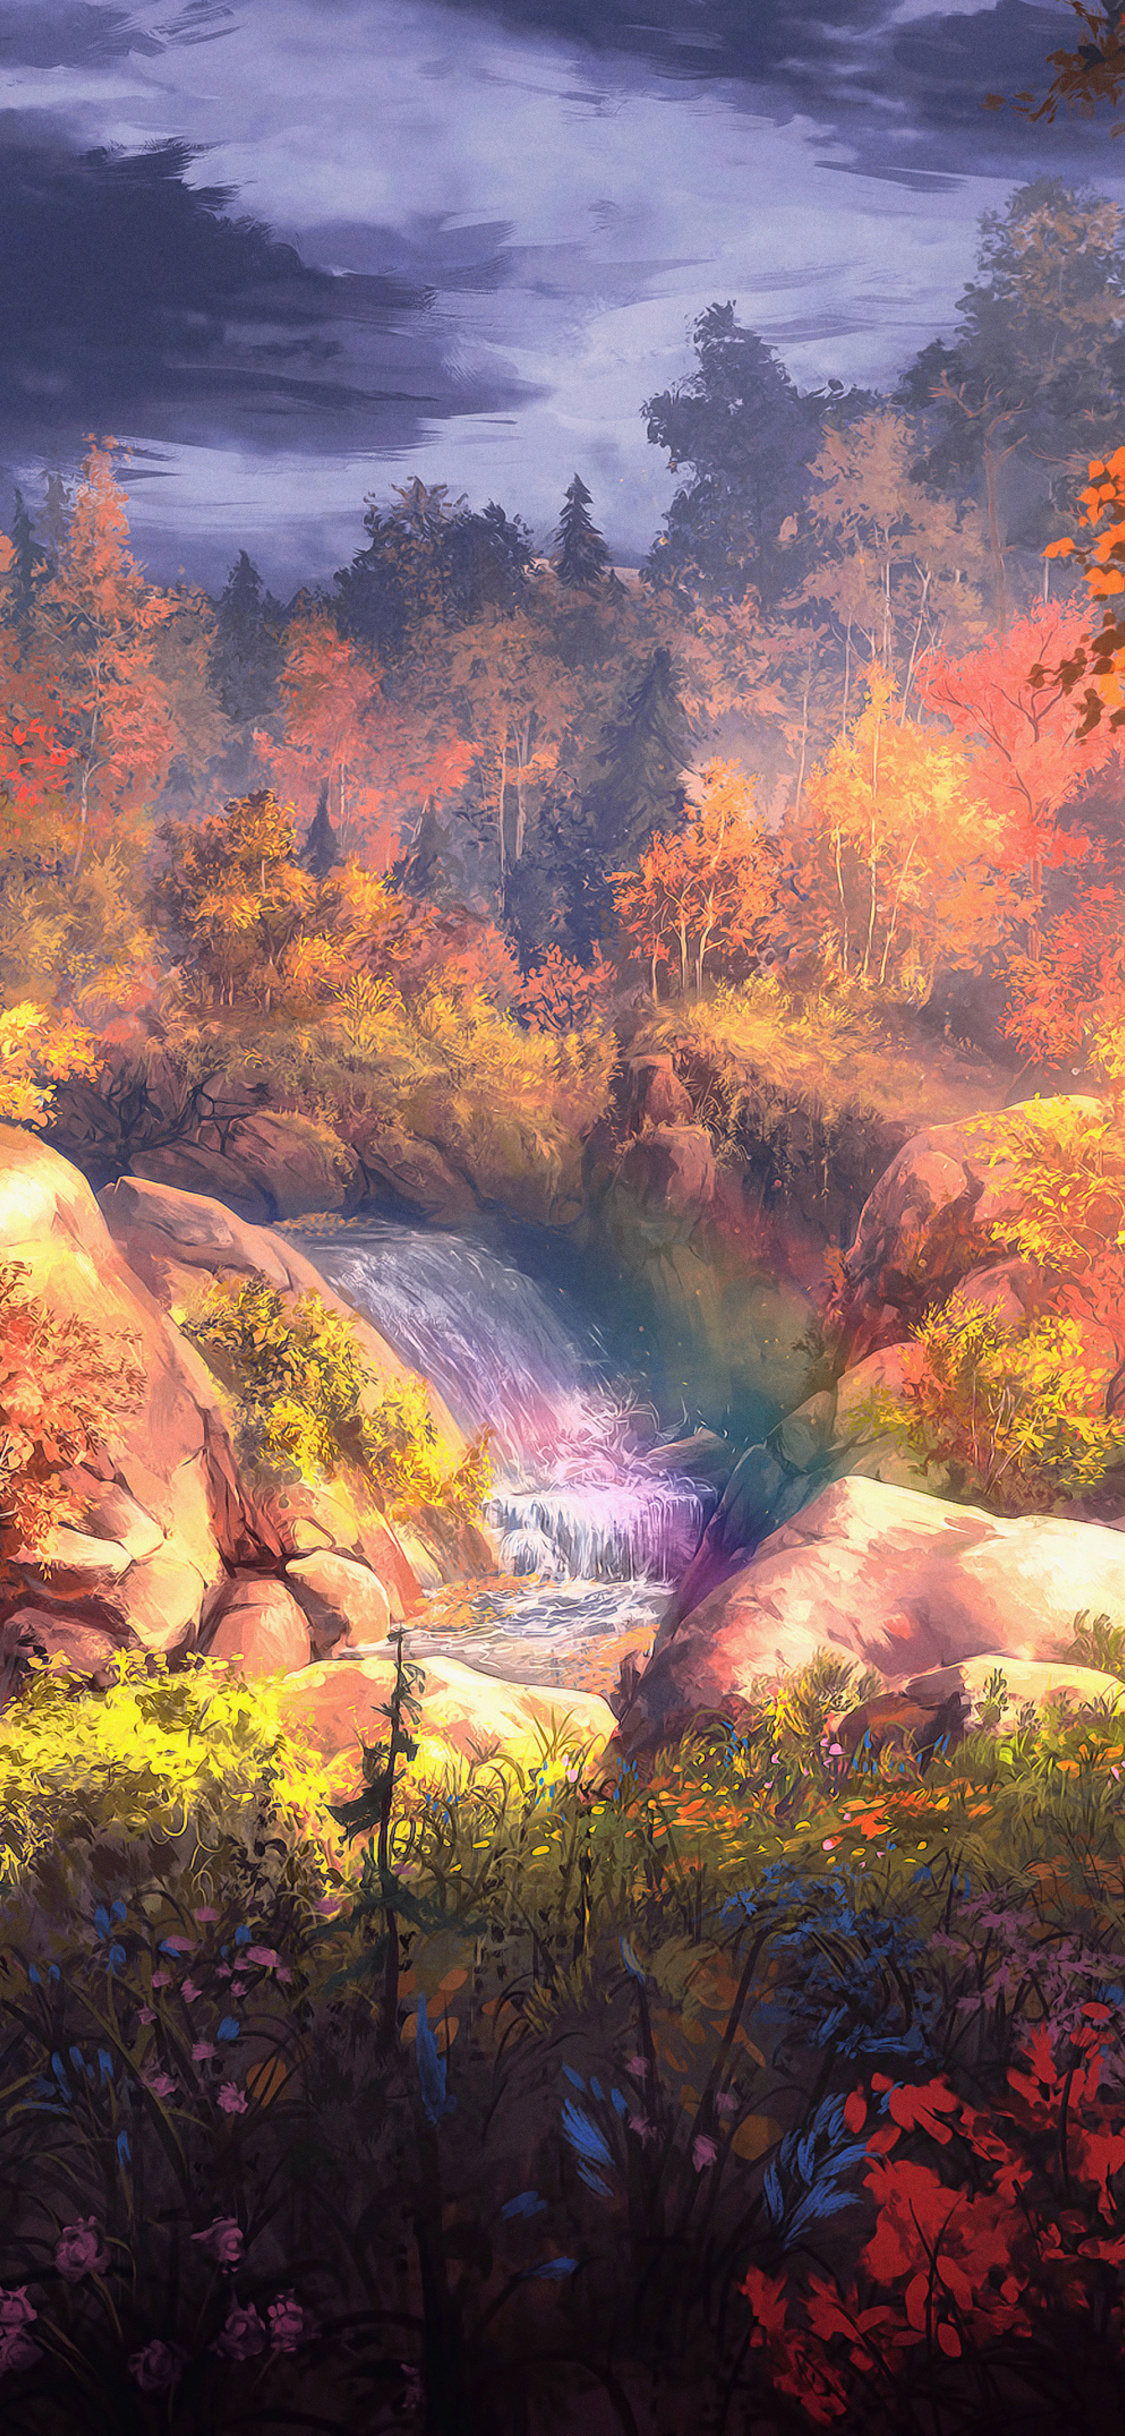 1125x2436 Fantasy Autumn Painting 4k Iphone Xs Iphone 10